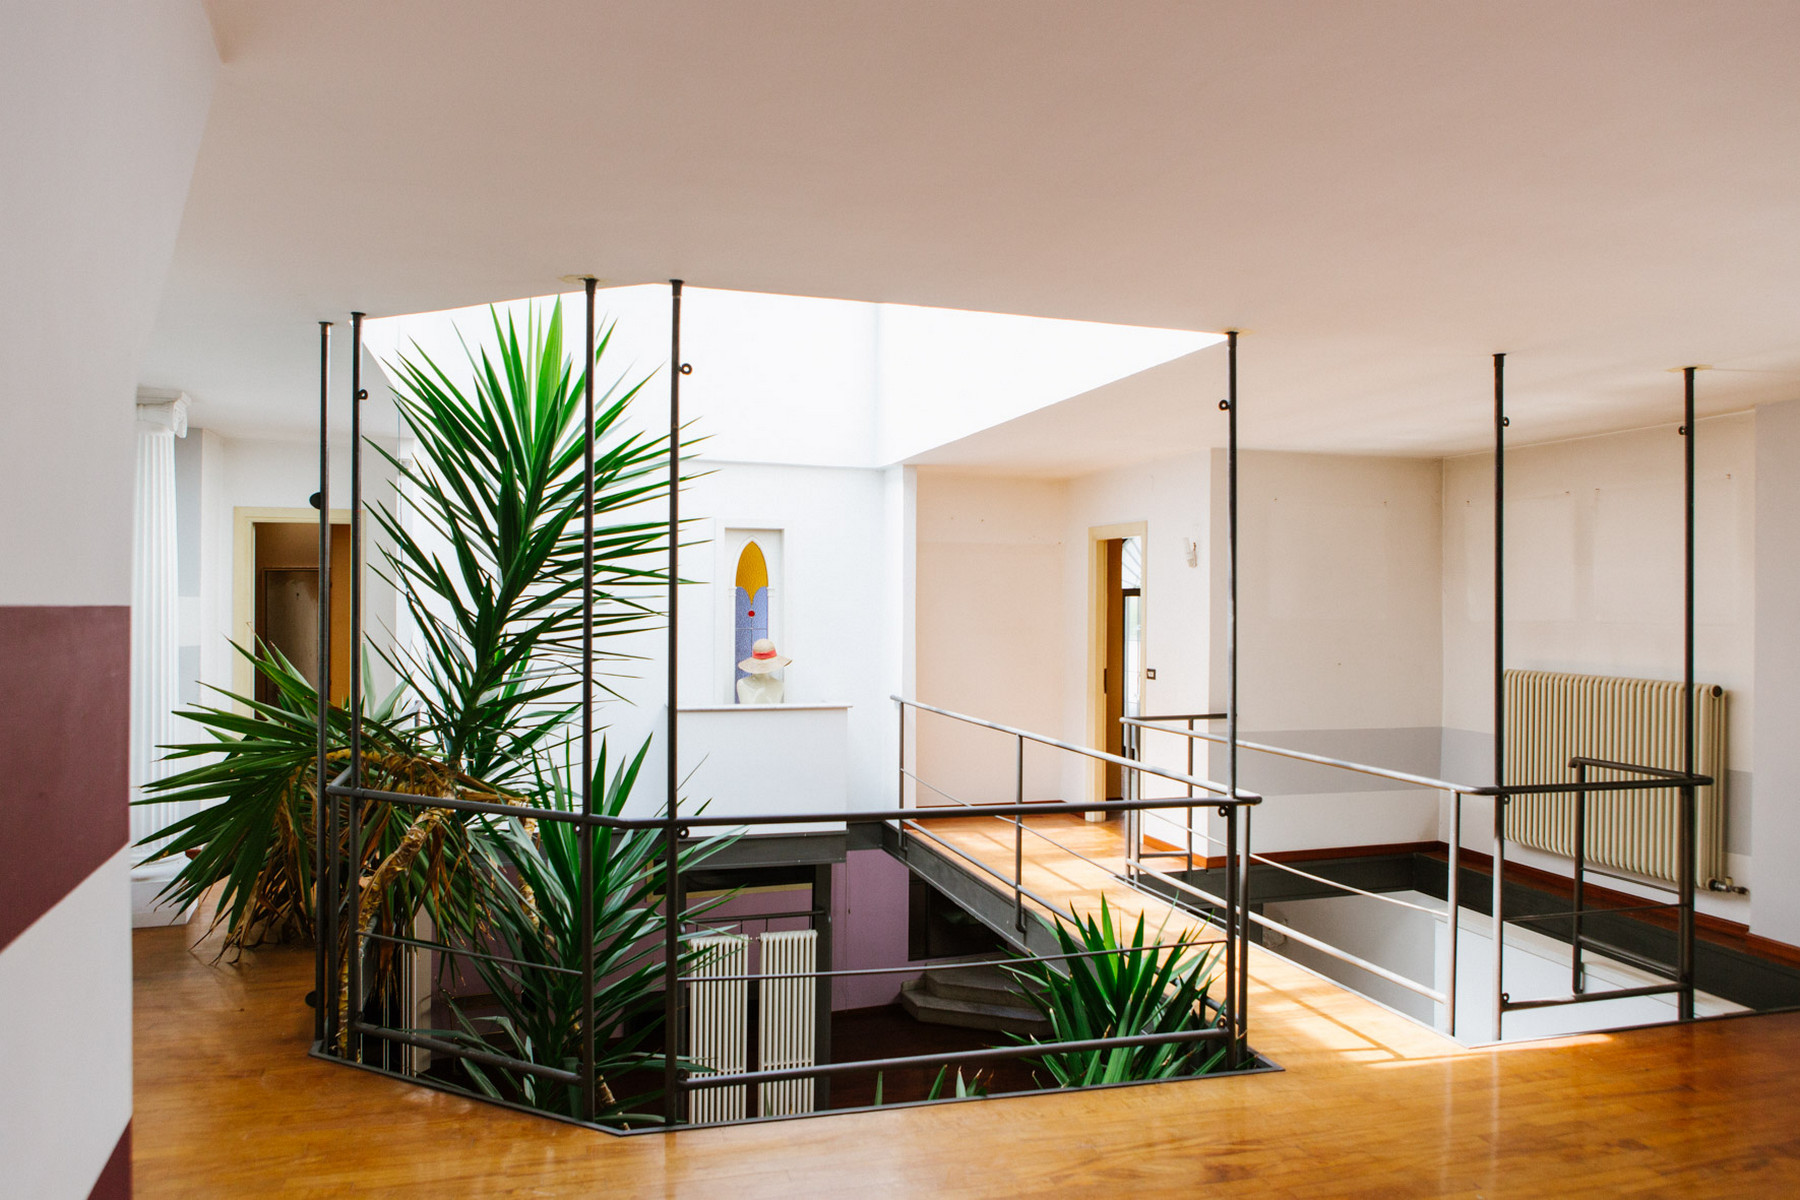 Casa indipendente in Vendita a Torino: 5 locali, 699 mq - Foto 5